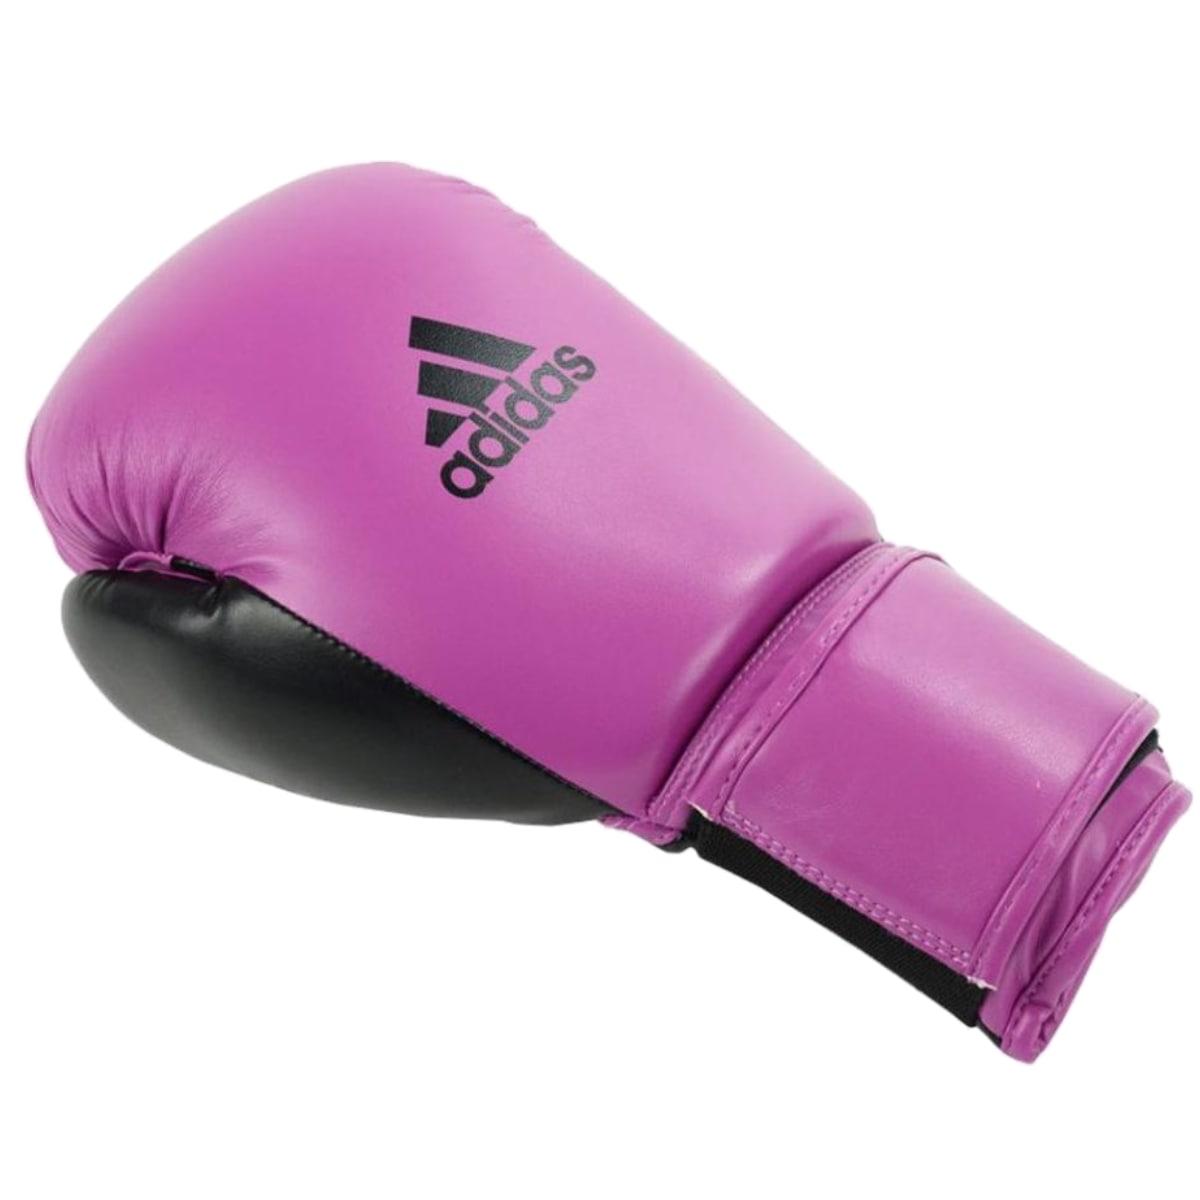 Luva Boxe Adidas Power 100 Colors - Rosa